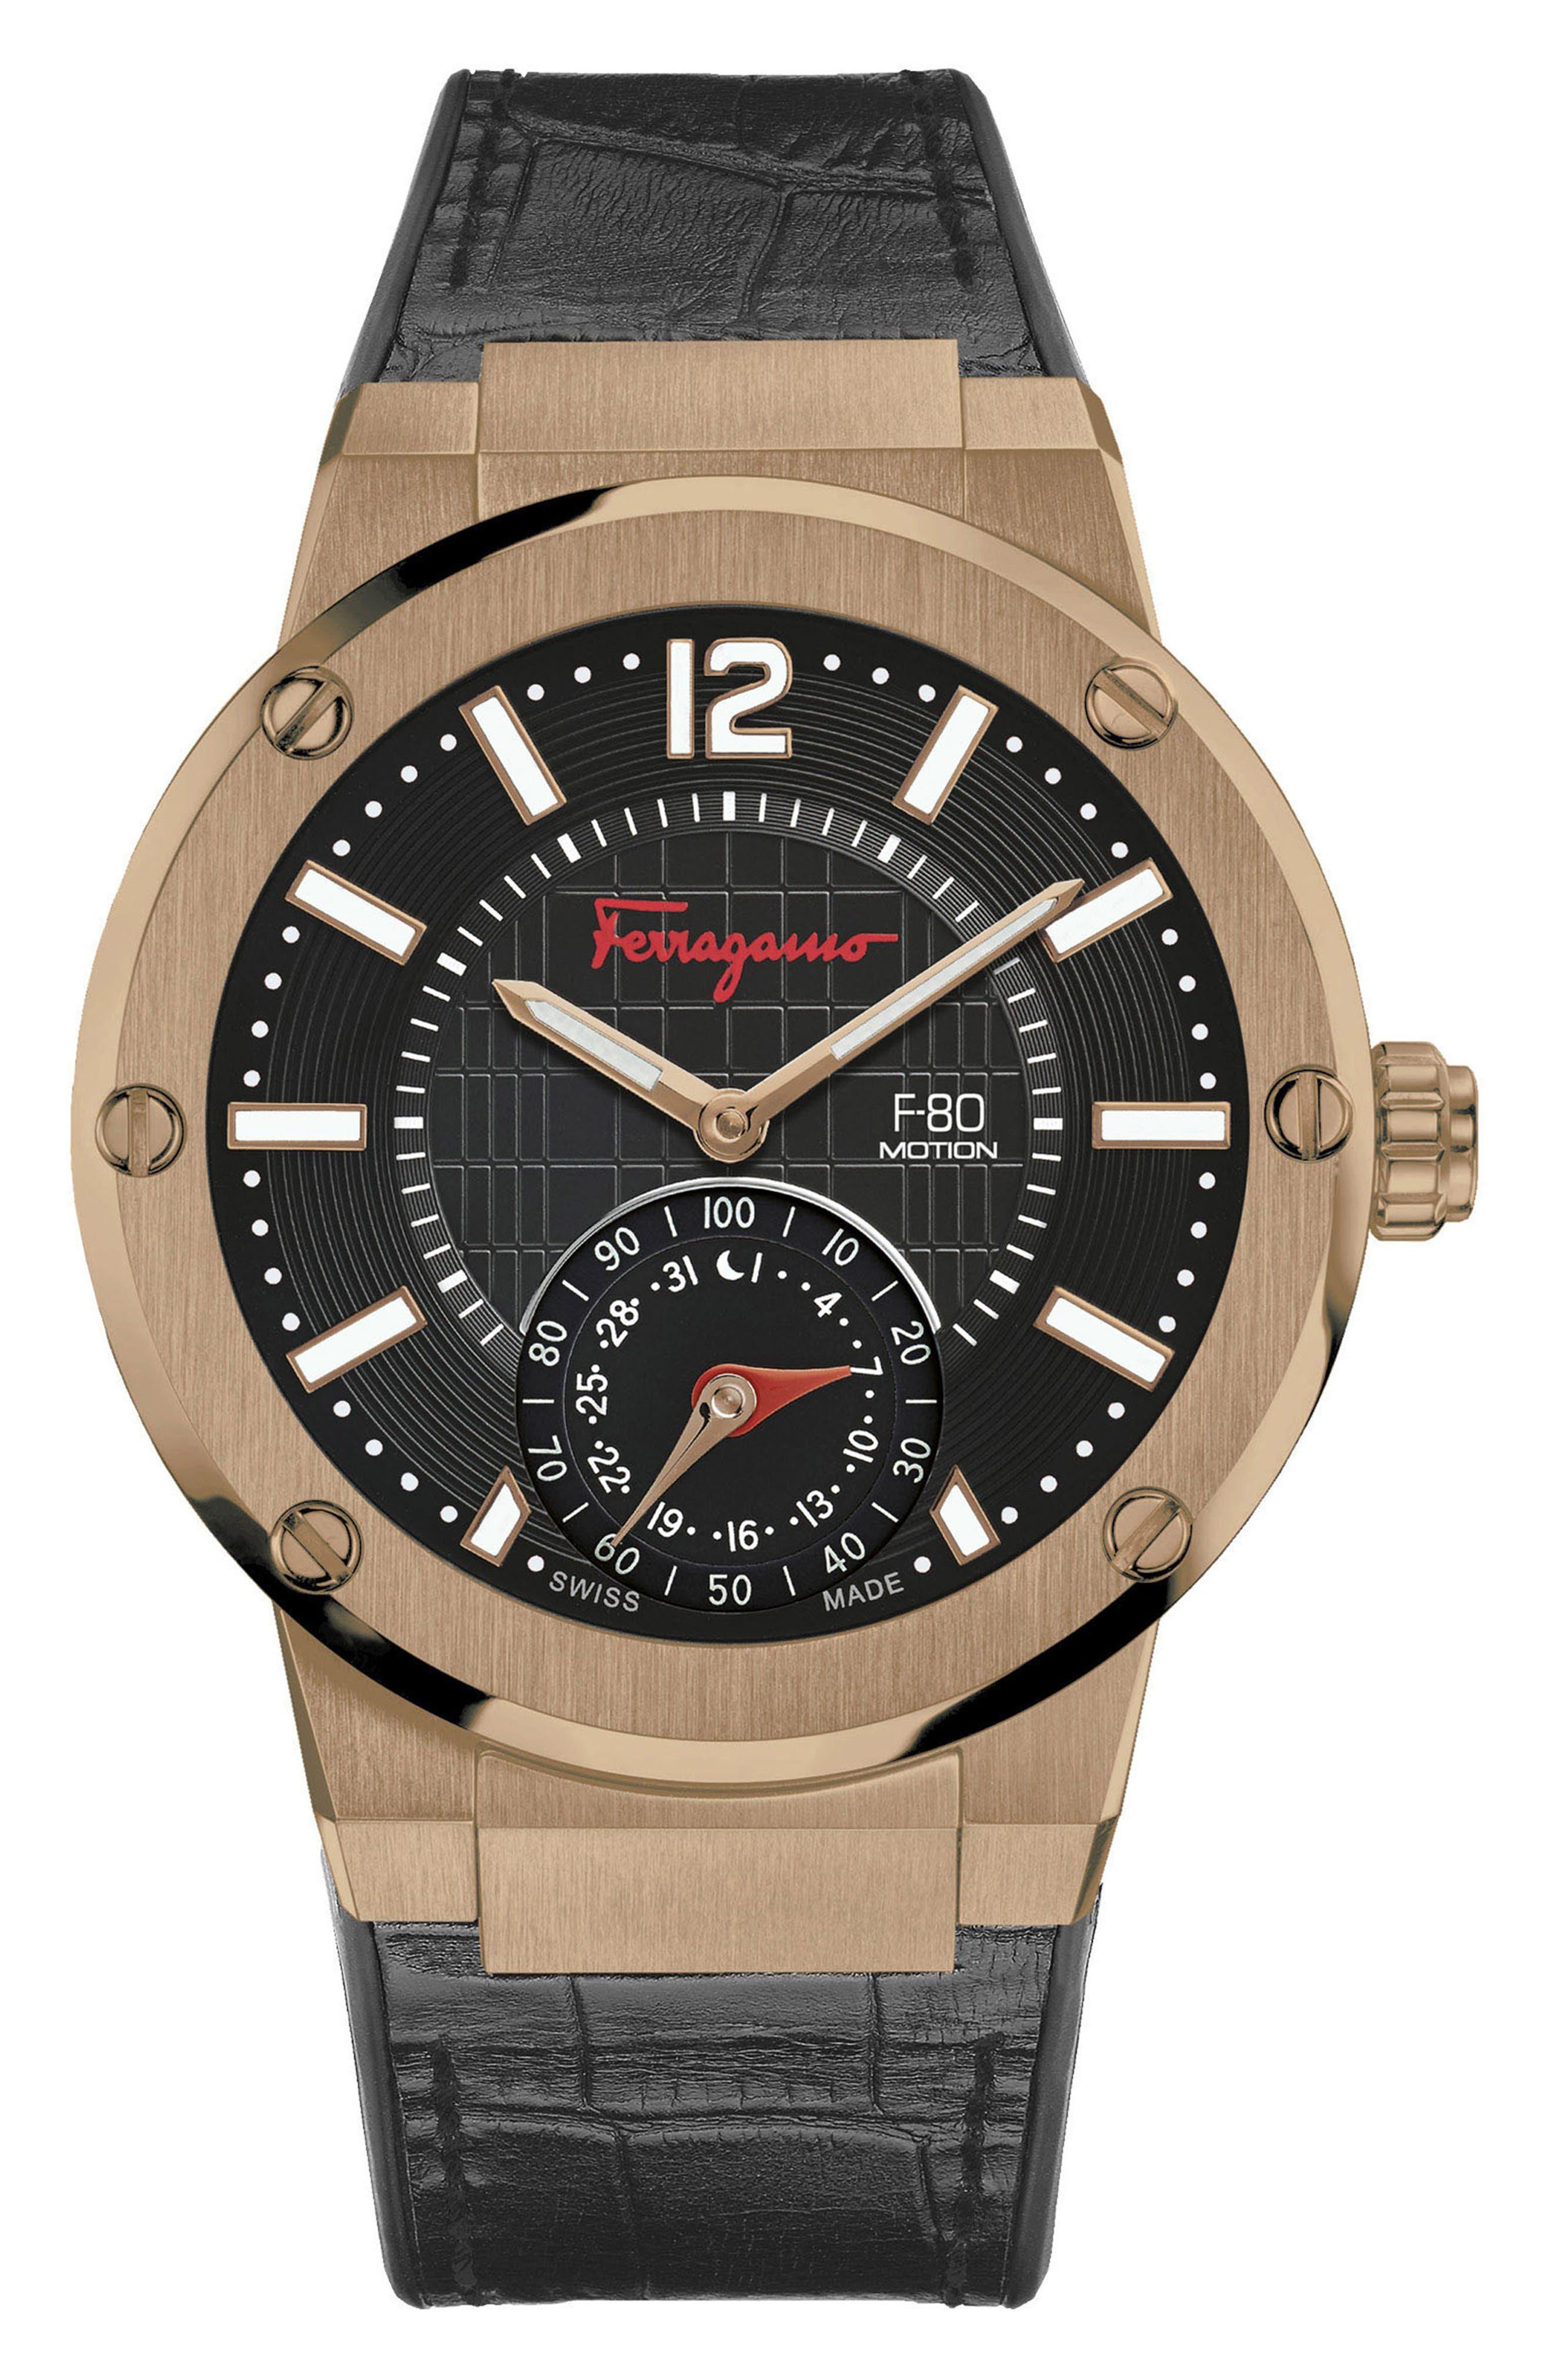 Alternate Image 1 Selected - Salvatore Ferragamo 'F-80 Motion' Leather Strap Smart Watch, 44mm